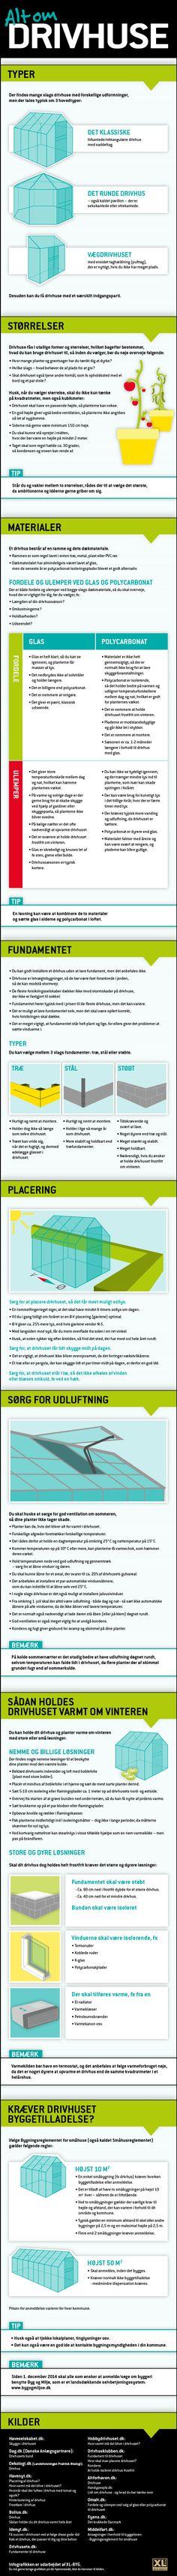 Drivhuse: Stor drivhus guide og infografik